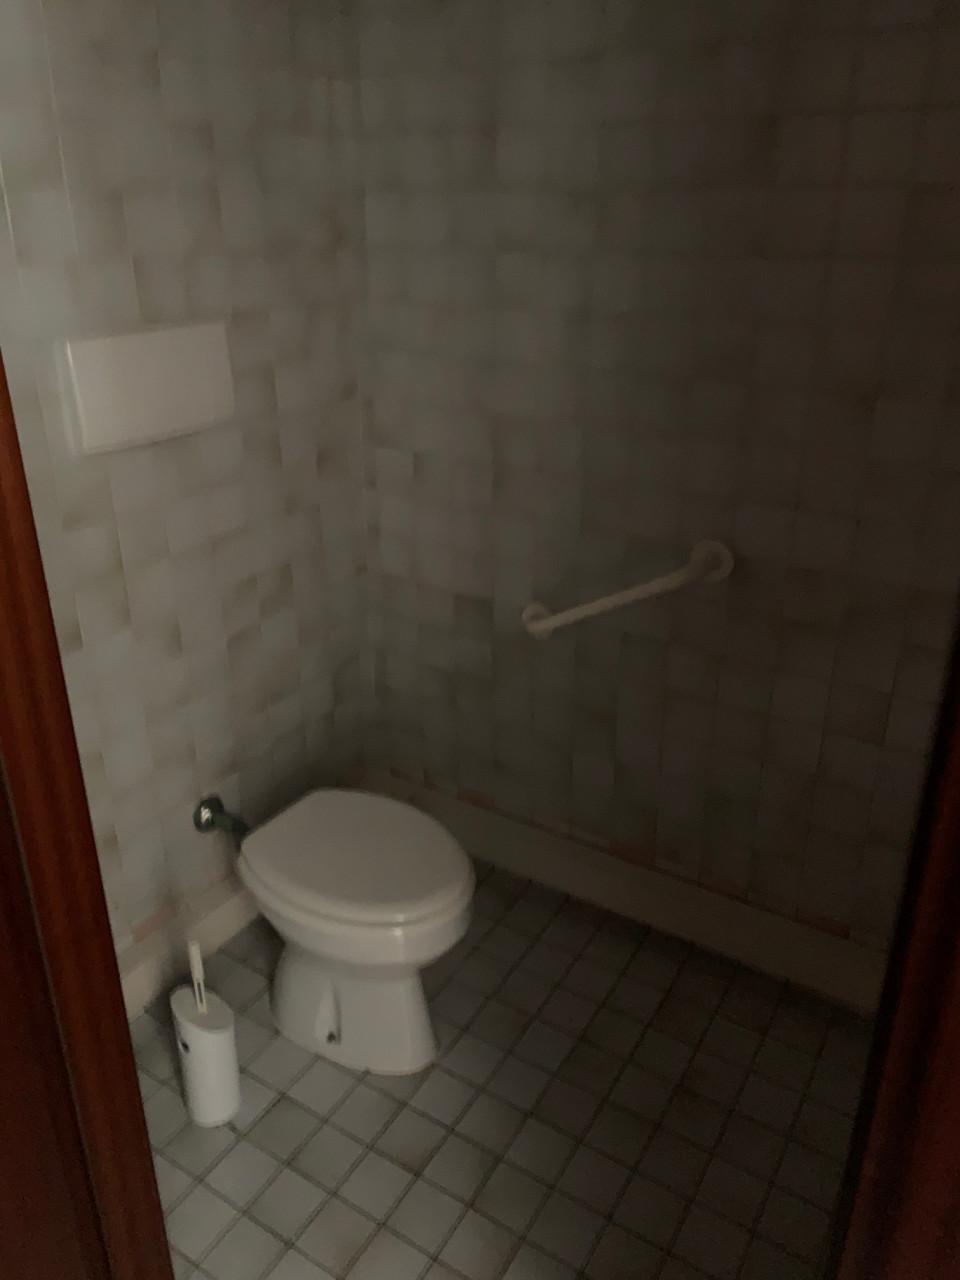 Offerta C551 - Negozio in affitto zona Pedonale https://images.gestionaleimmobiliare.it/foto/annunci/210719/2695659/1280x1280/999__5.jpg